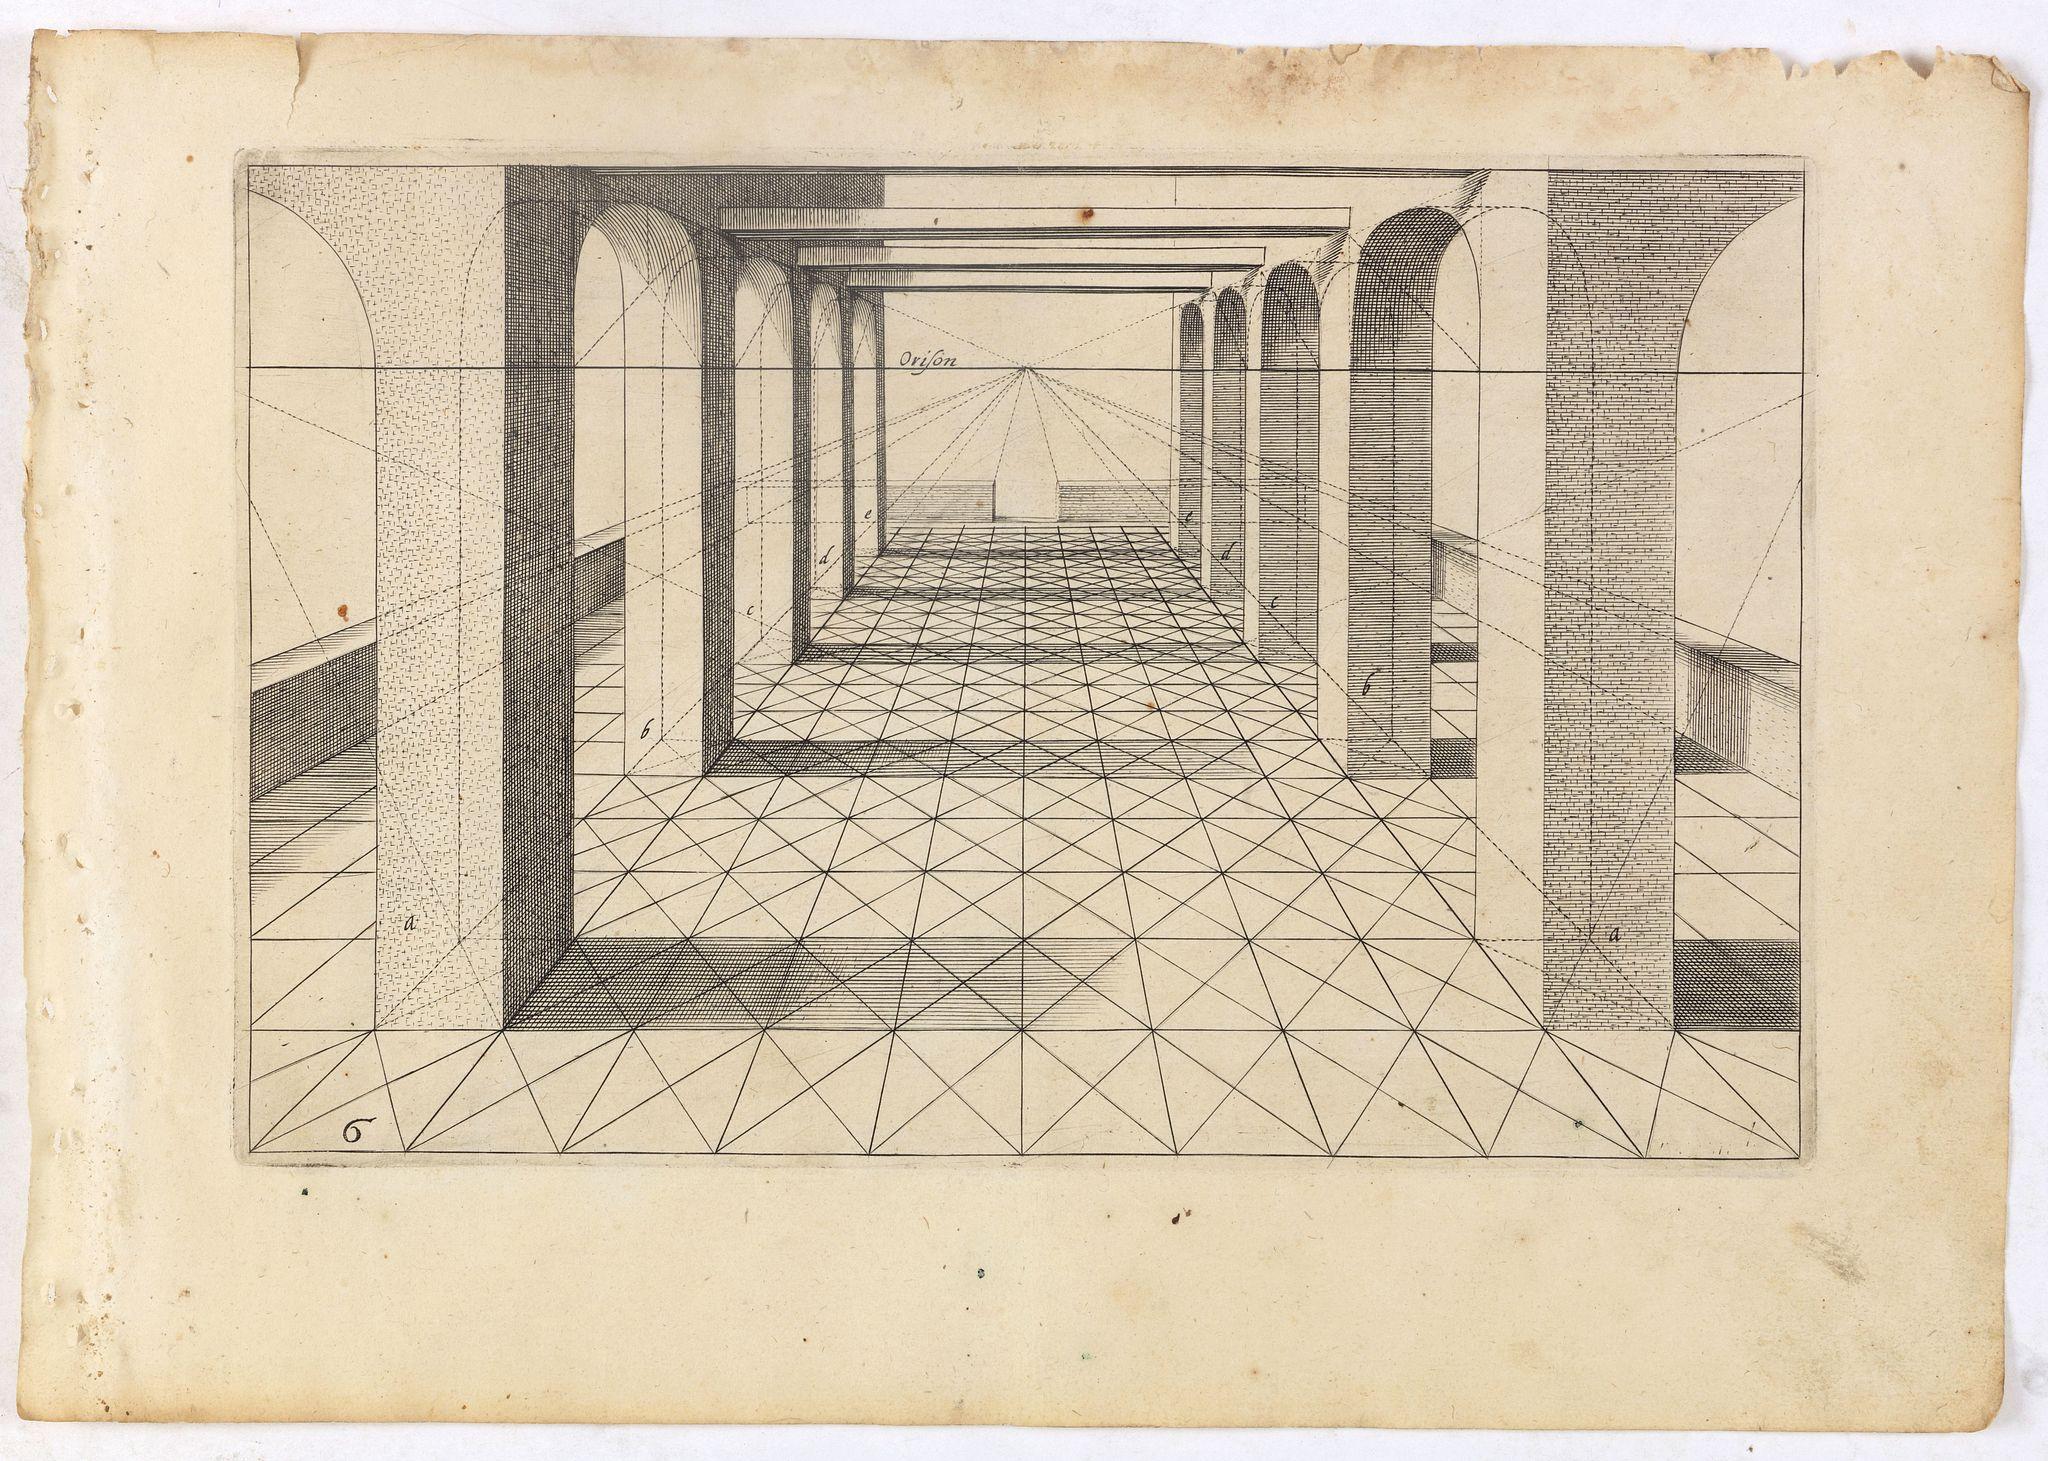 VREDEMAN DE VRIES, J. / HONDIUS, H. -  Perspective print by Vredeman de Vries. 6